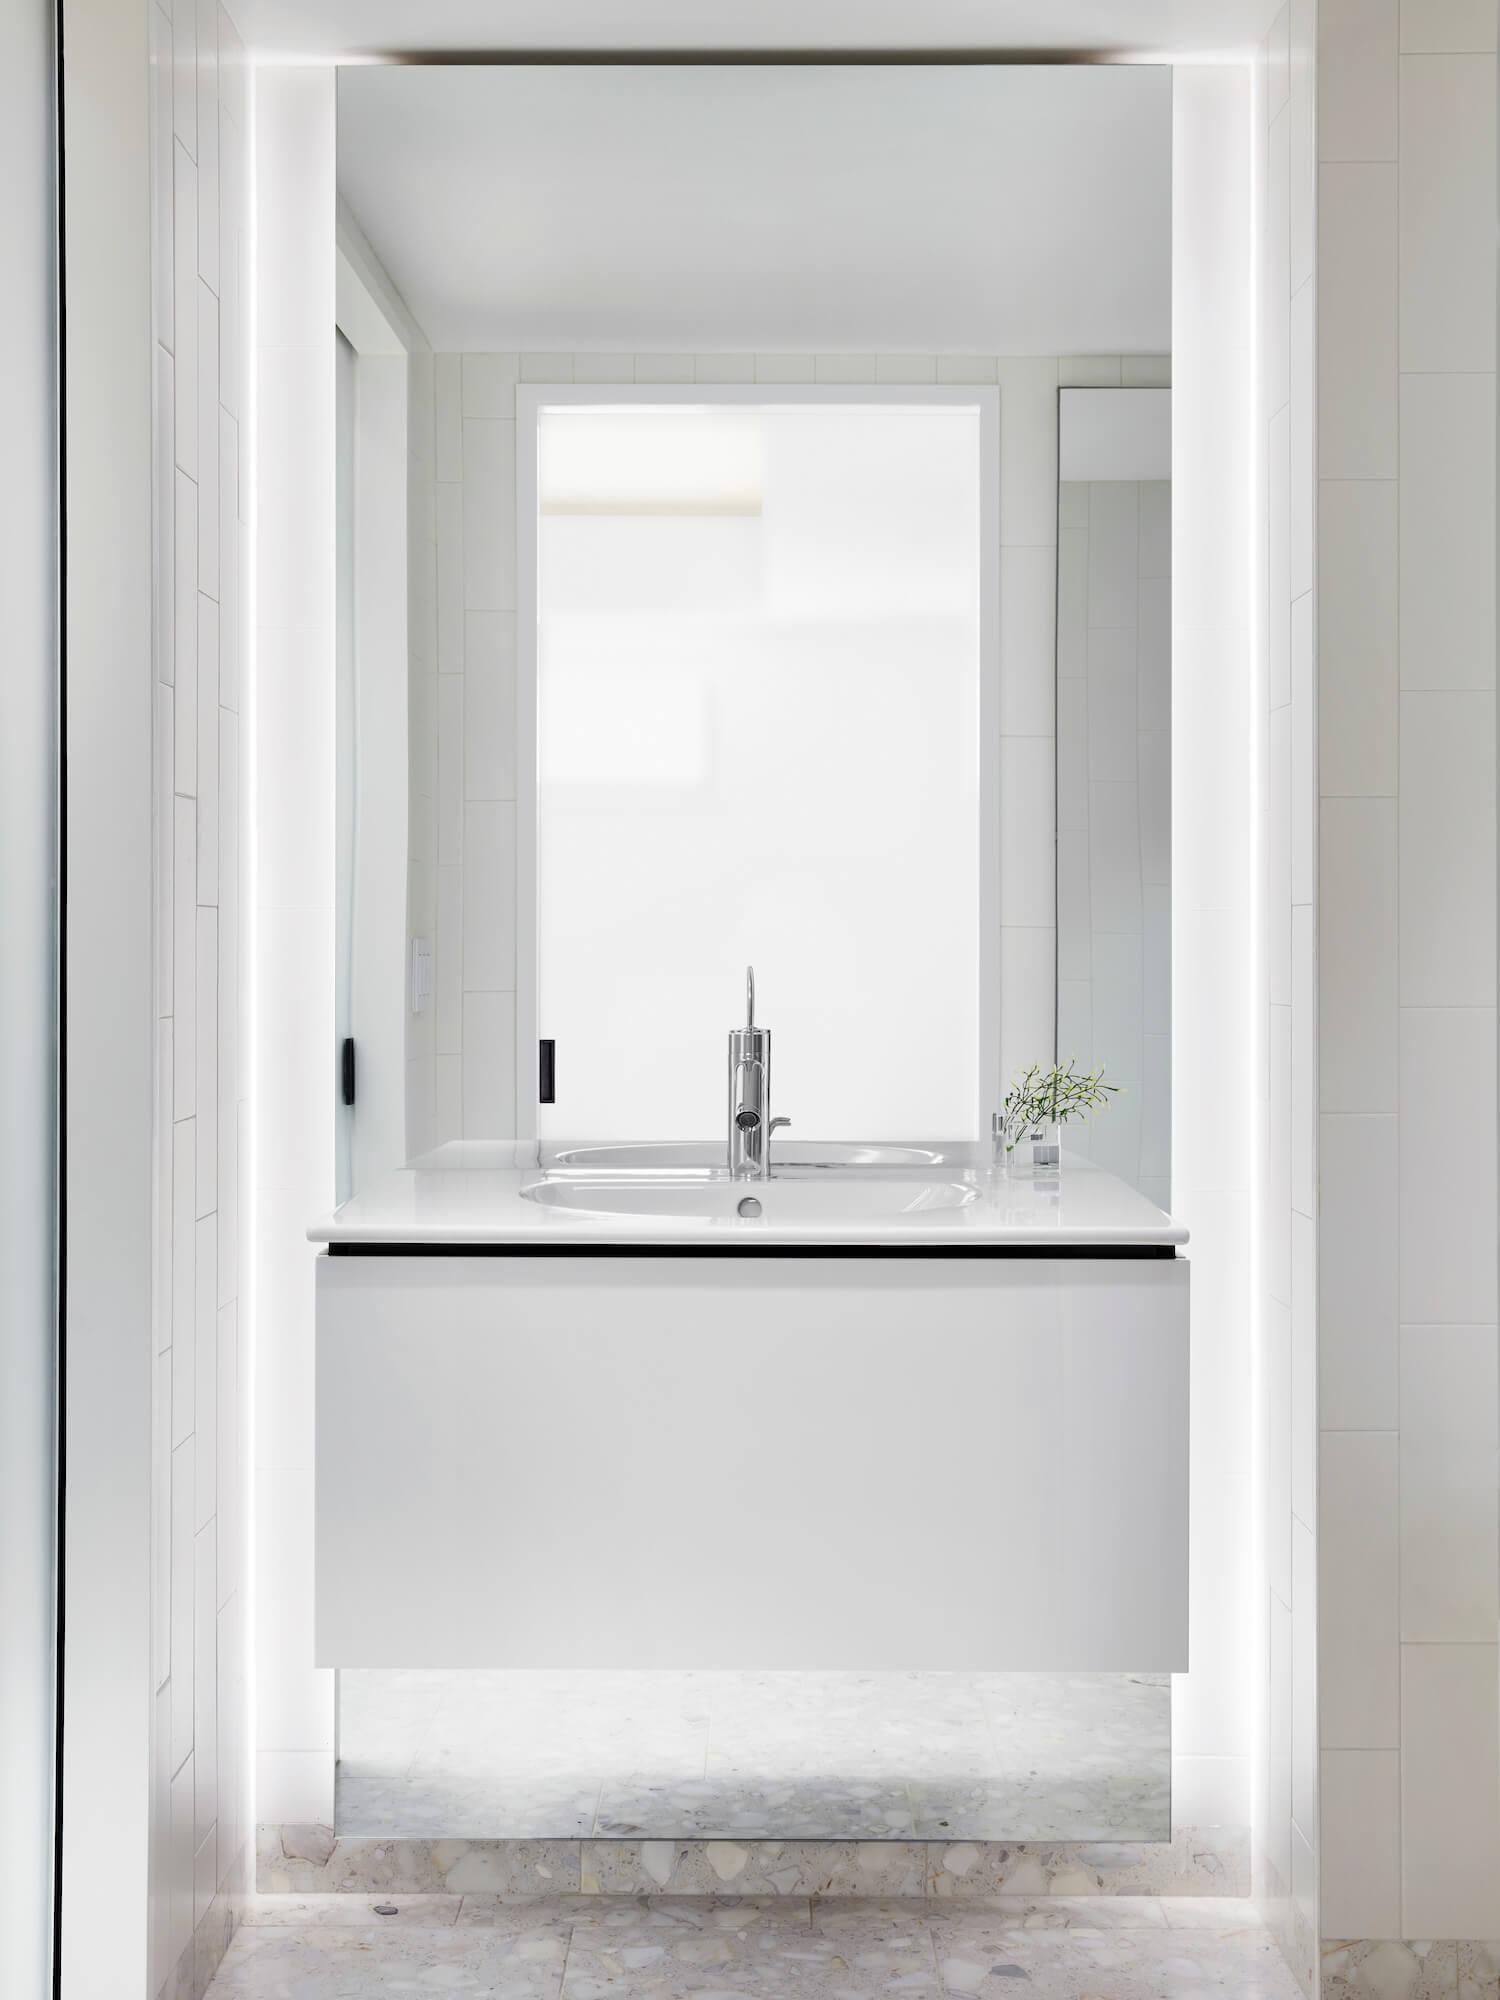 est living STADTArchitecture Chelsea Pied a Terre Bathroom 1